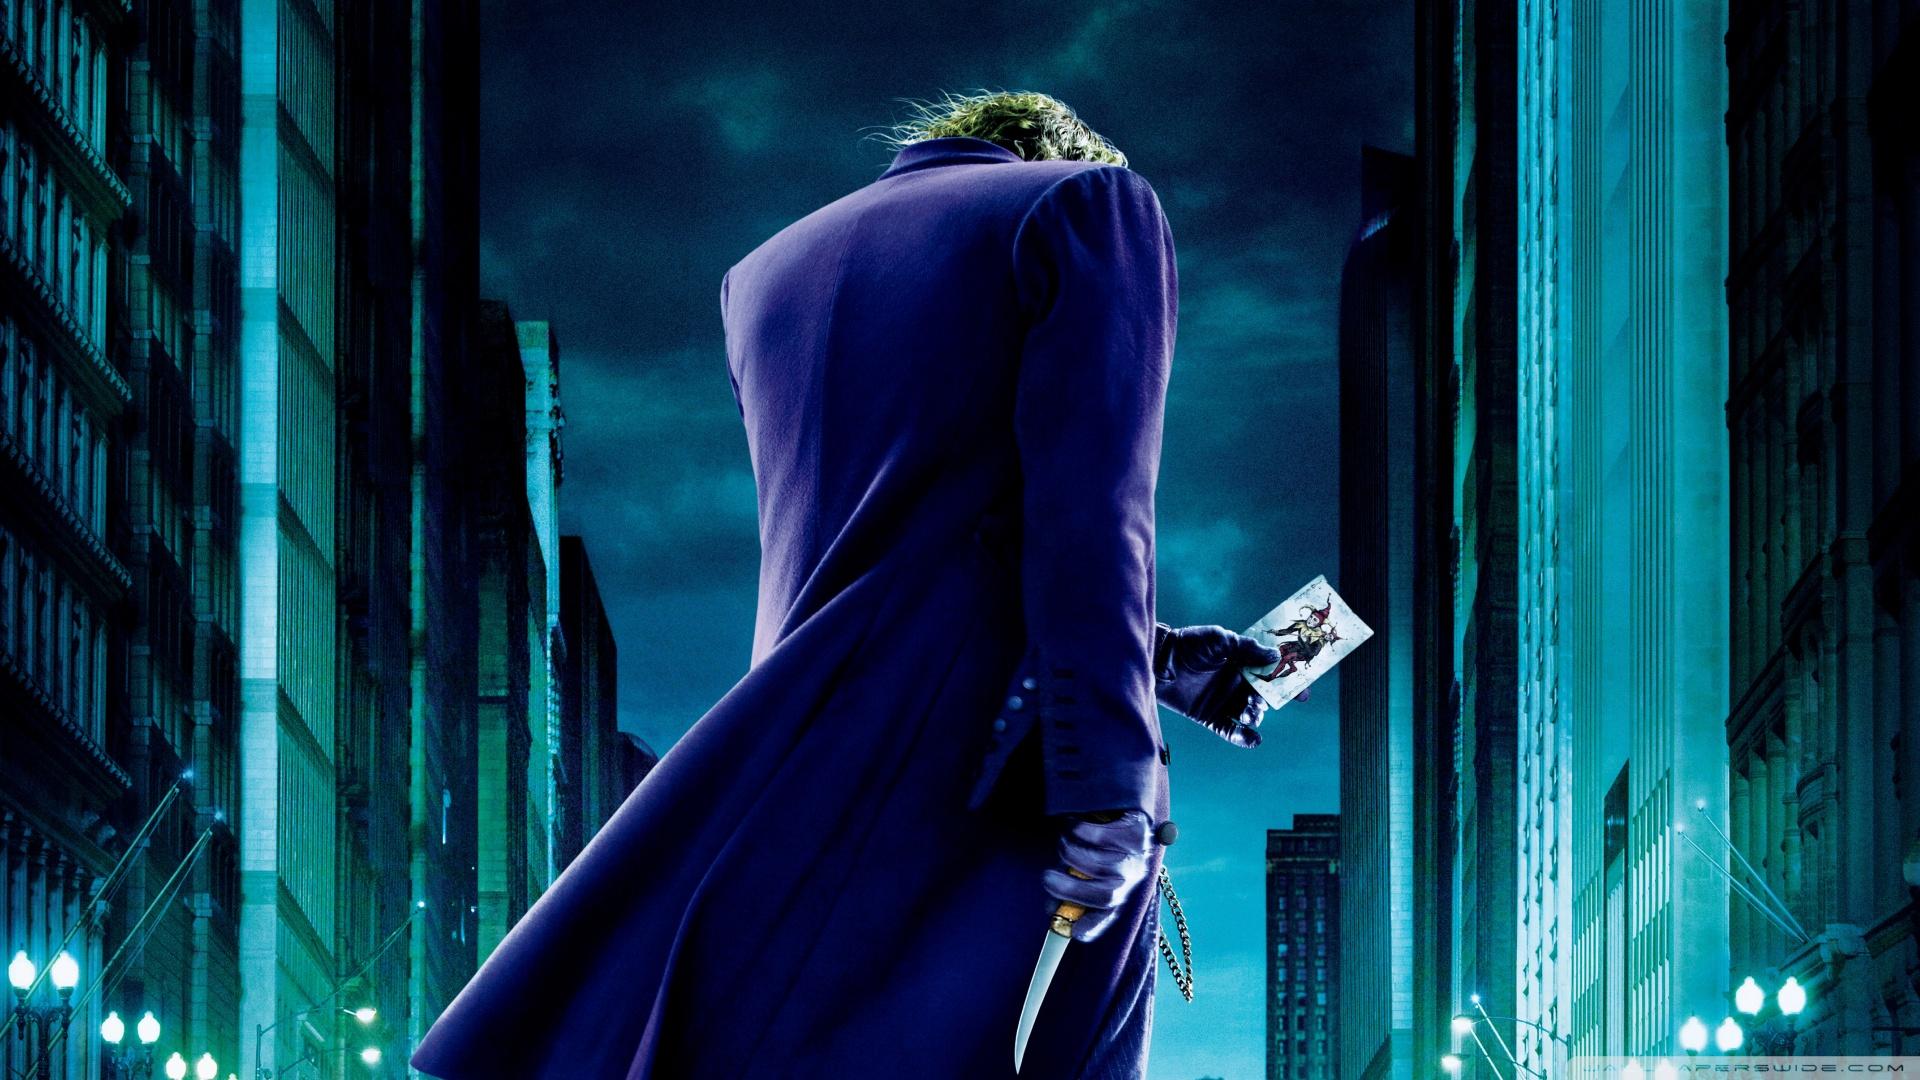 75 Joker The Dark Knight Wallpaper On Wallpapersafari